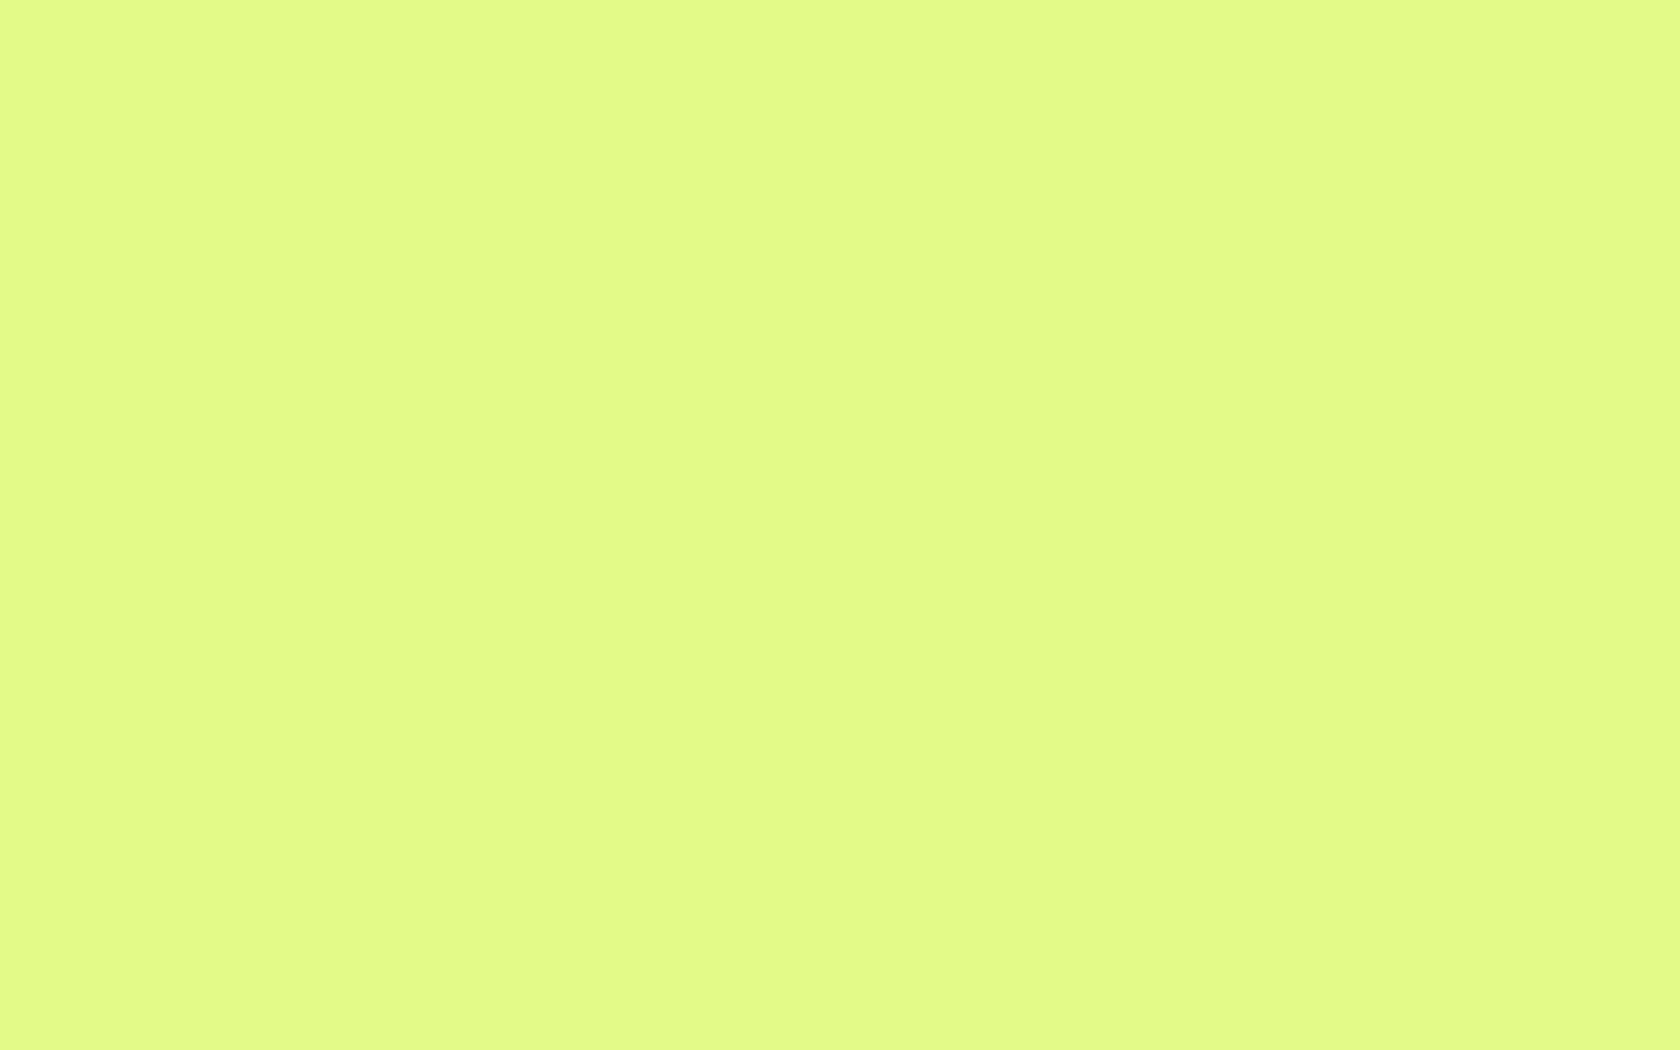 1680x1050 Midori Solid Color Background